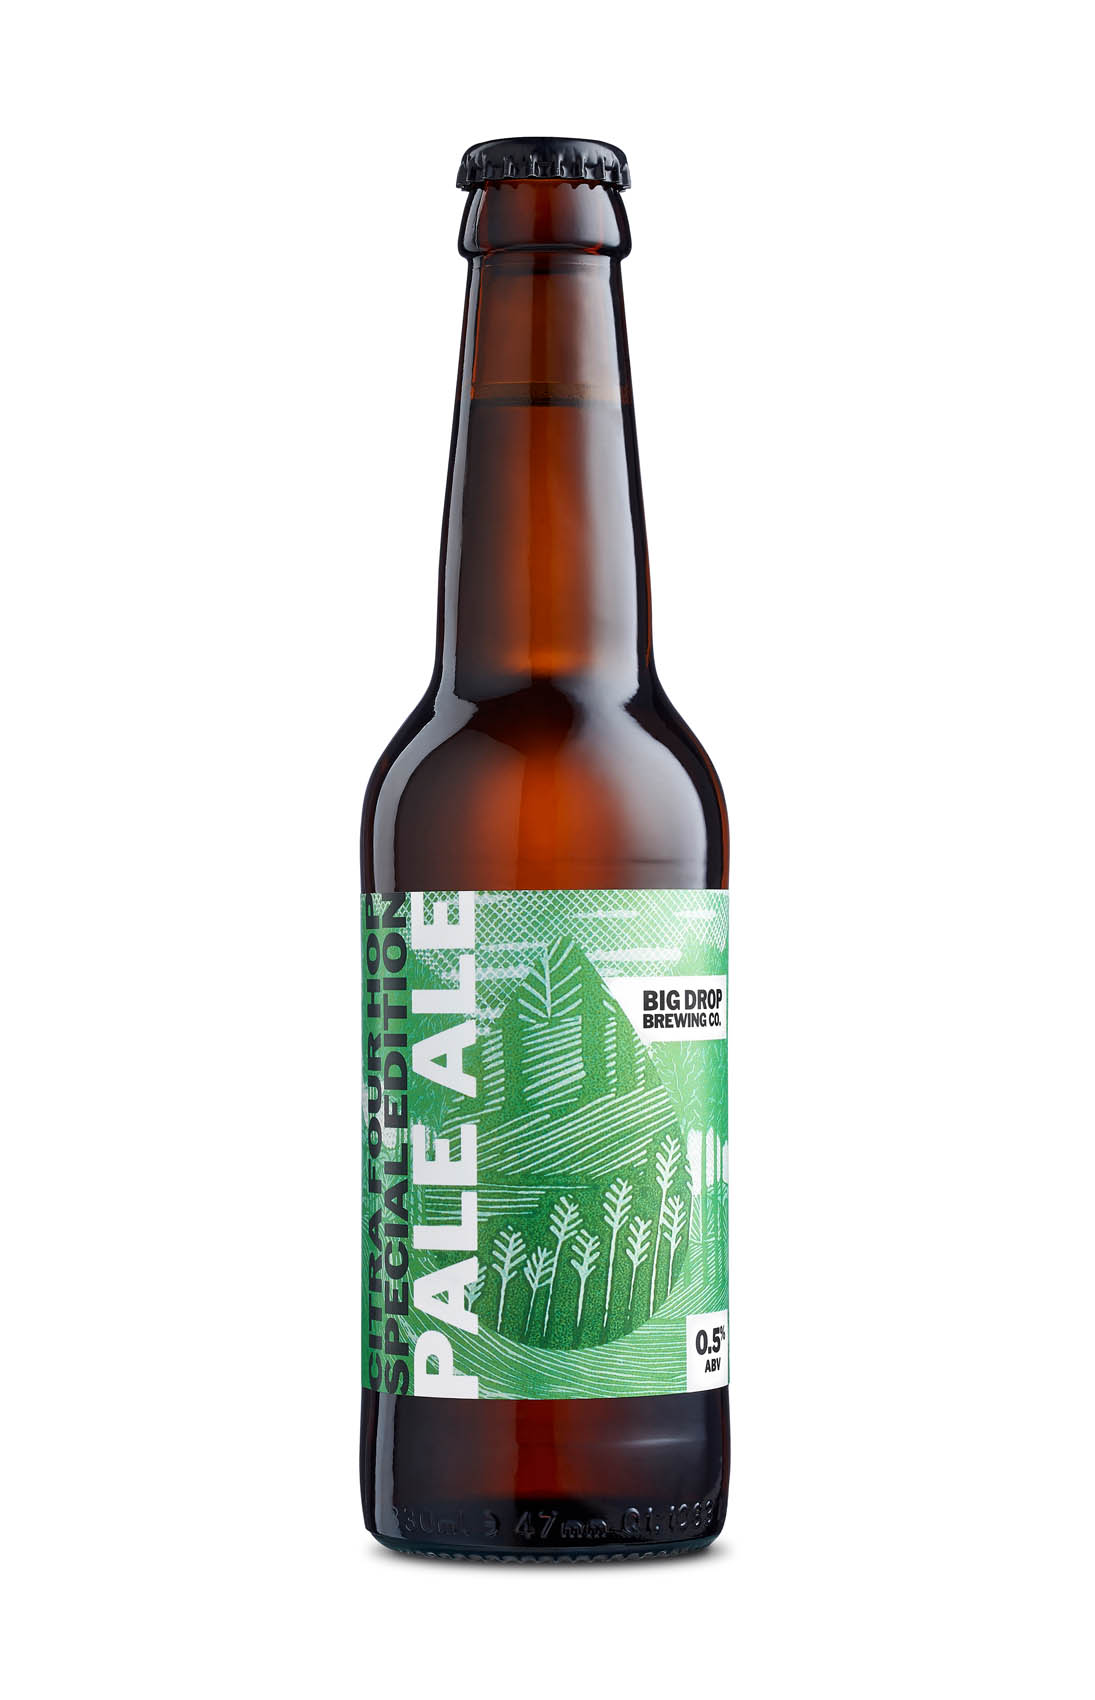 Big Drop Brewery Citrus Pale Ale